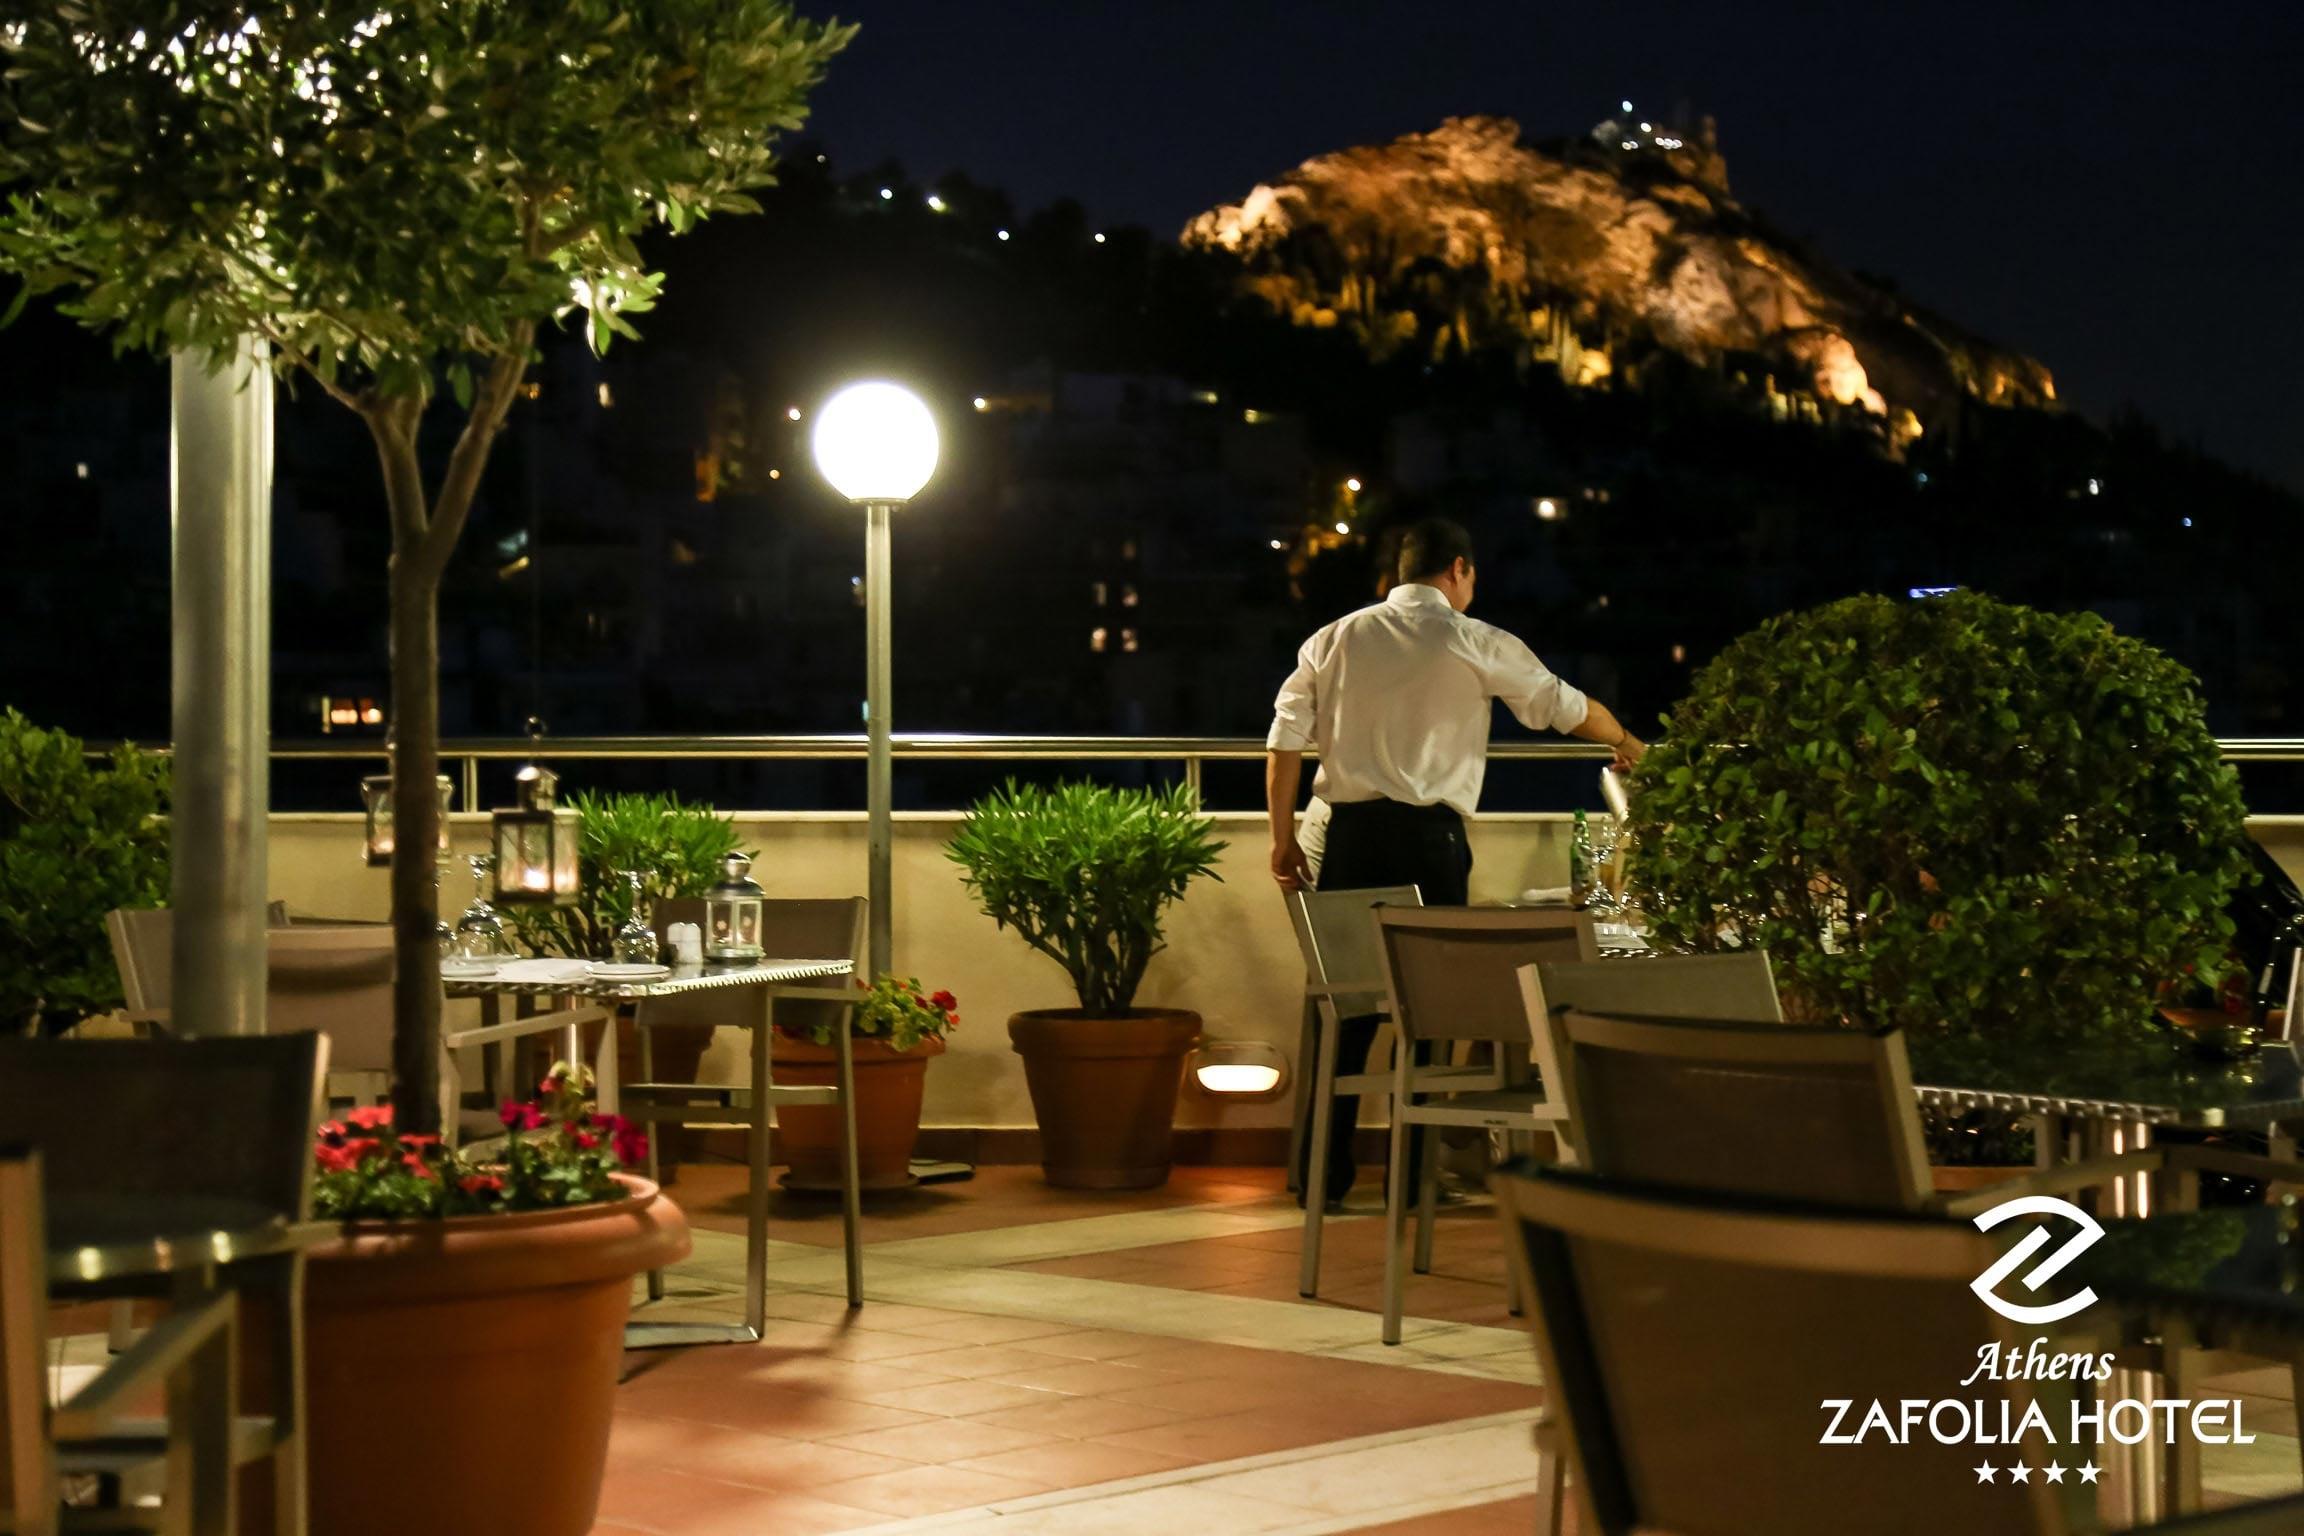 Athens Zafolia Hotel Official Website